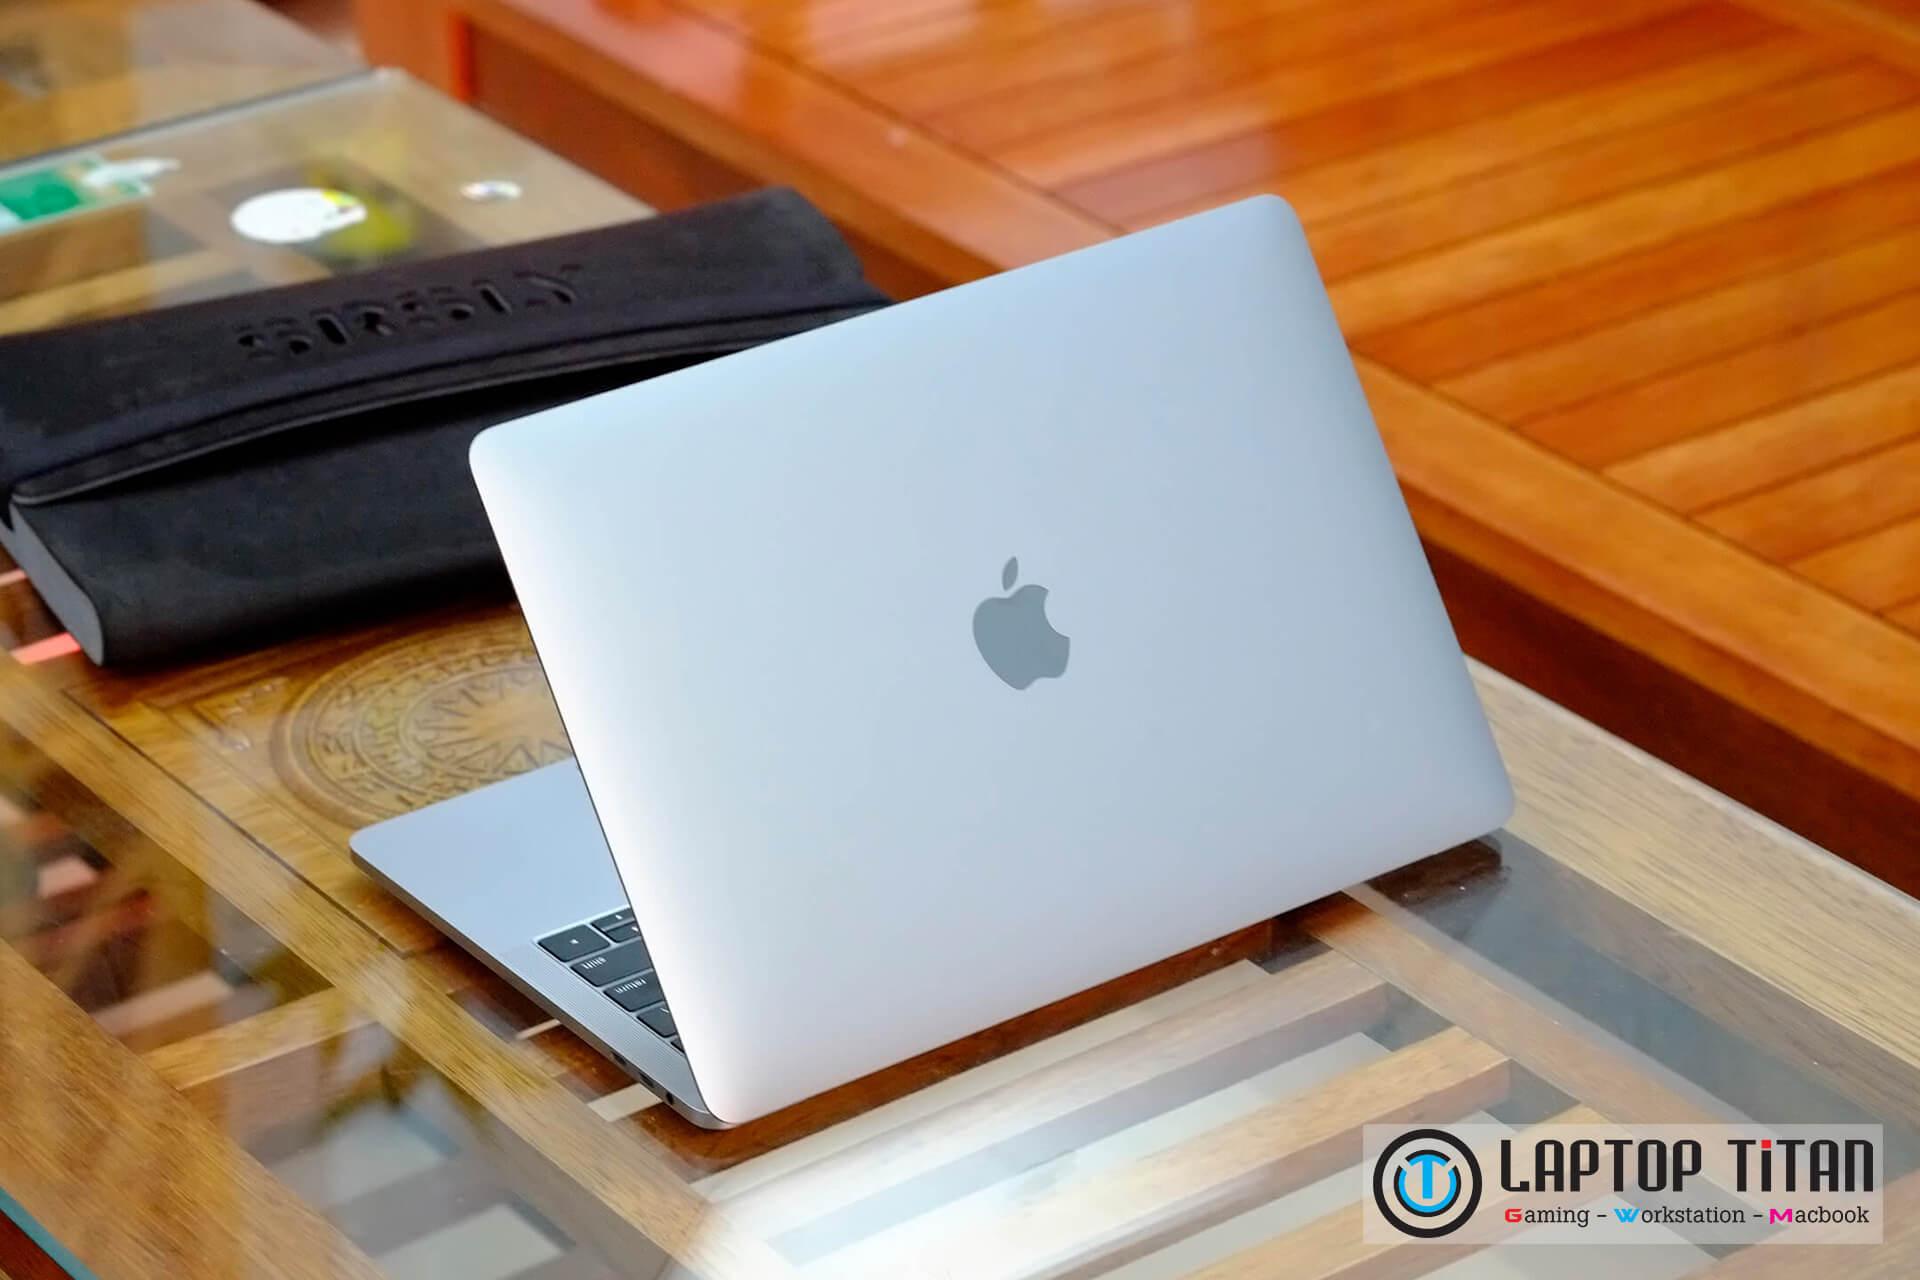 Macbook Pro Touch Bar 13.3 inch 2018 MR9V2 Core i5 / 8GB / 512GB / Sliver / 98%